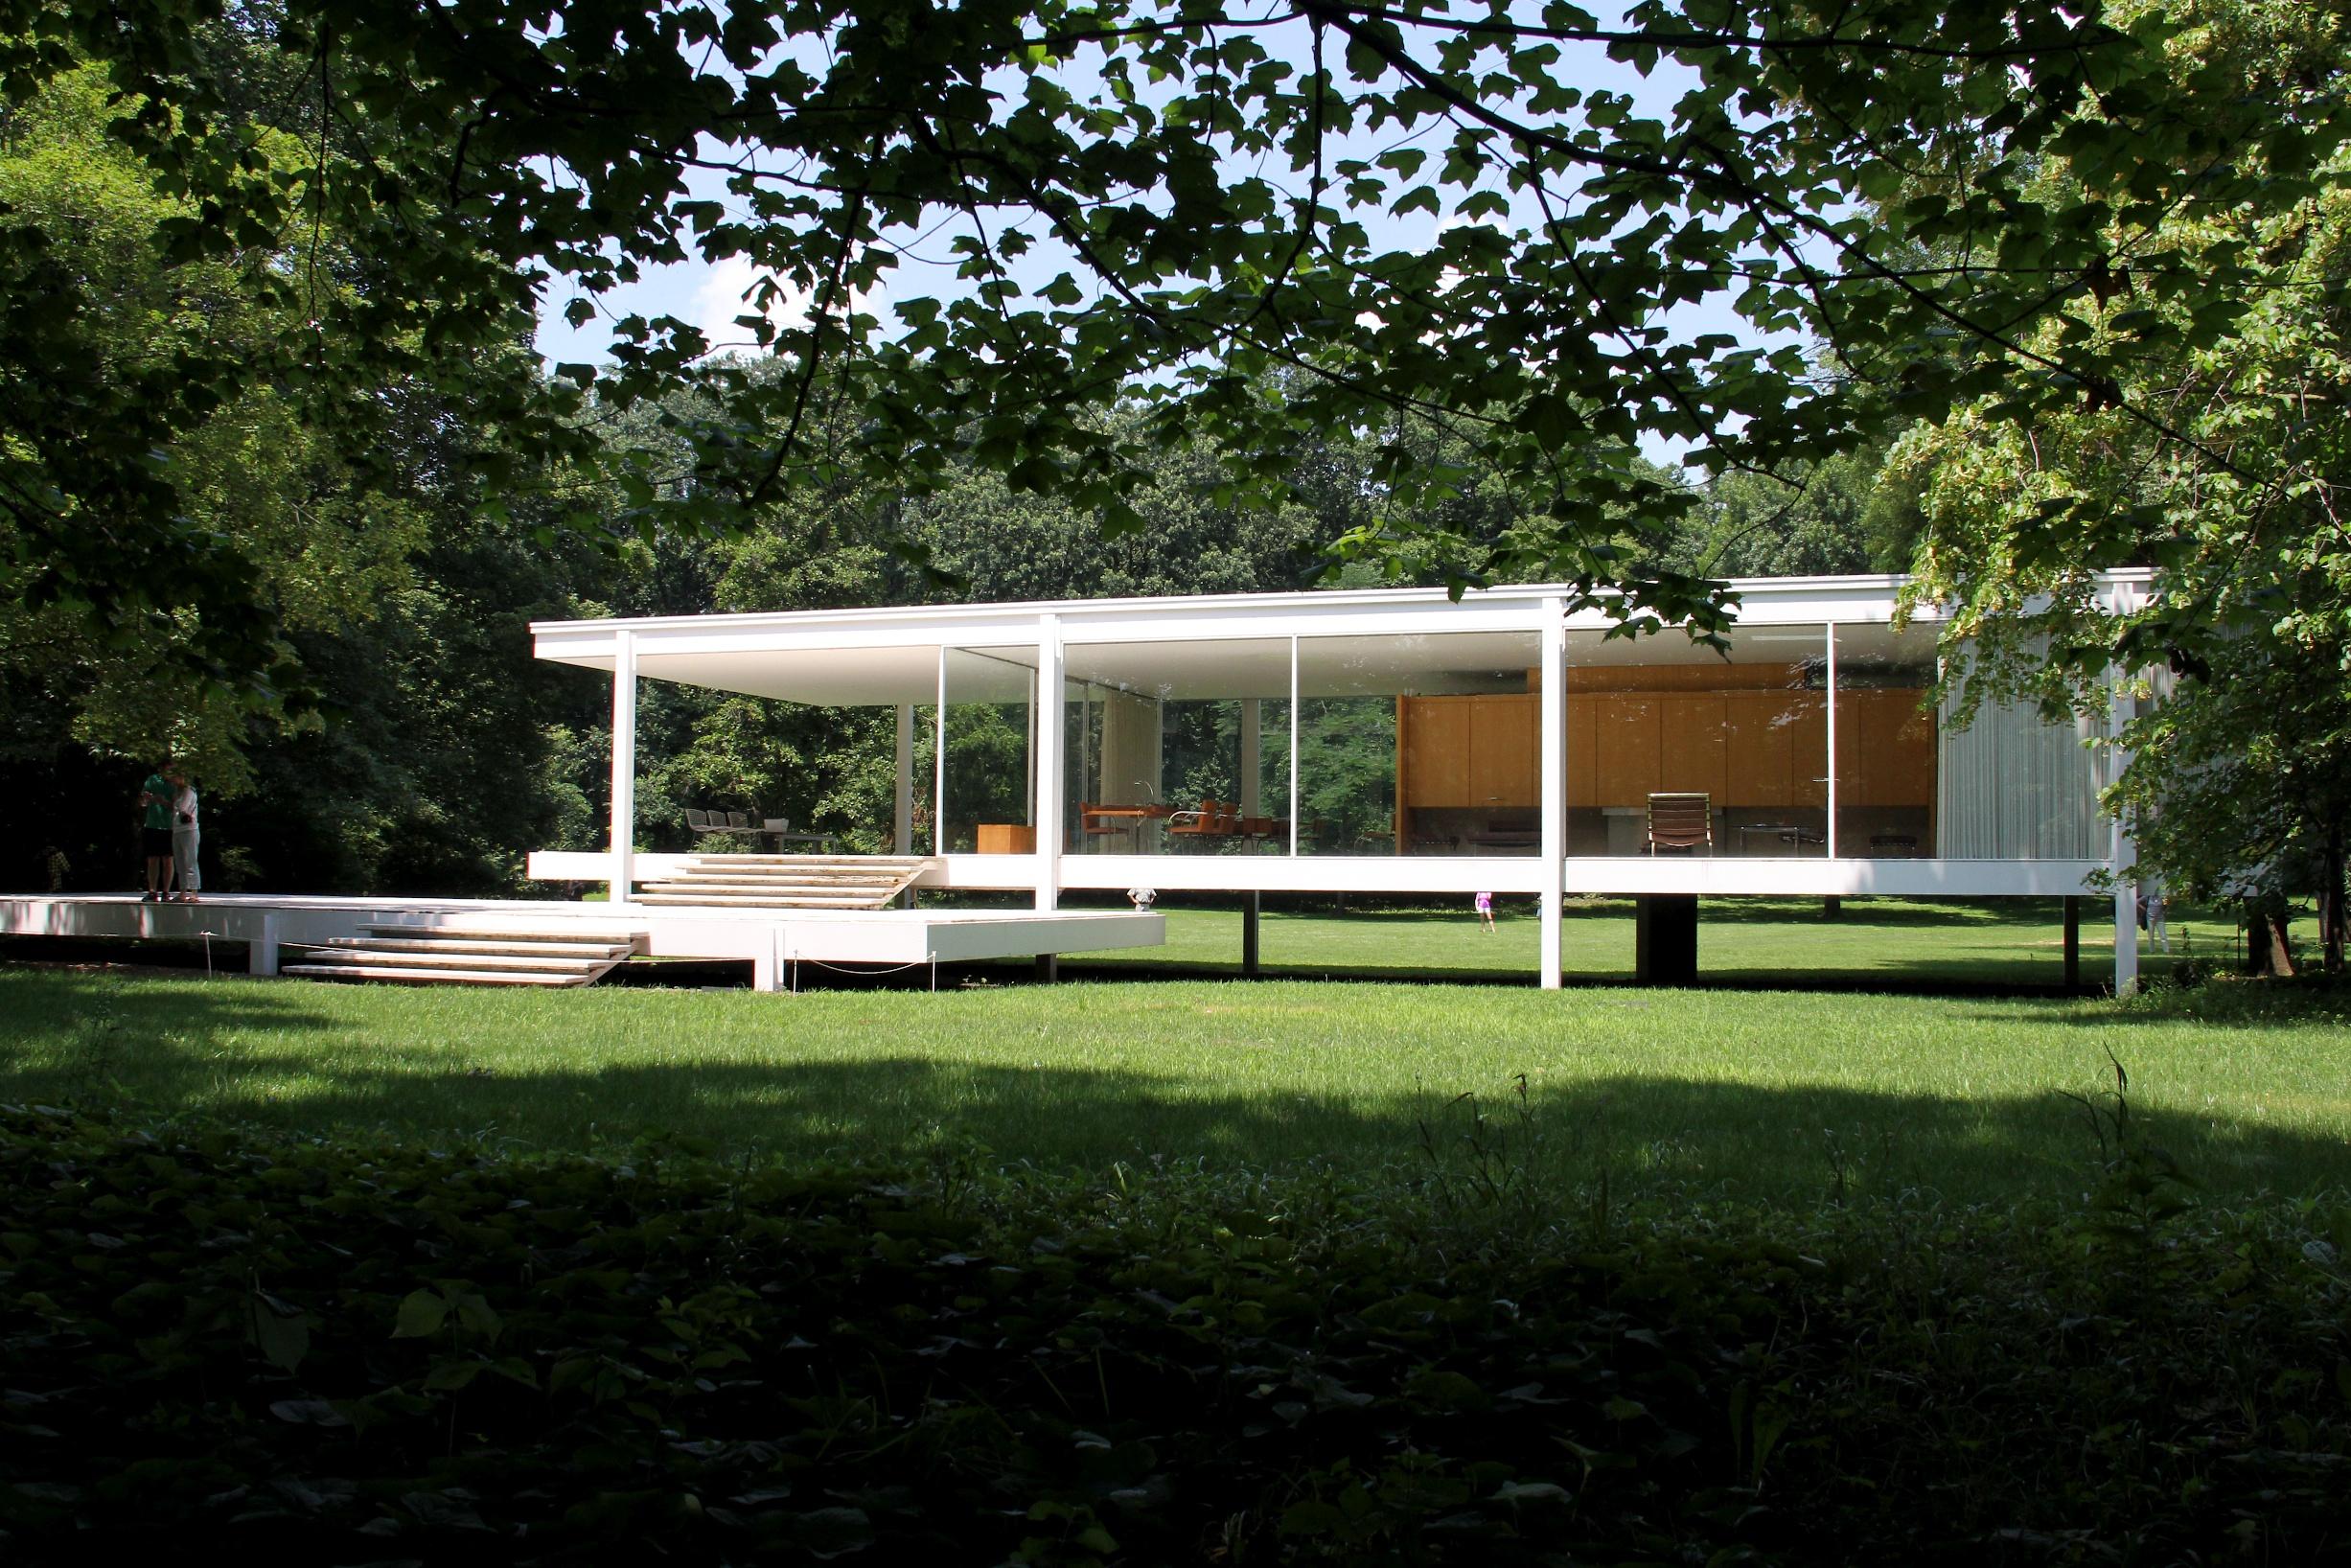 Veneer Kitchen Cabinets Farnsworth House 1951 Traverse360 Architecture